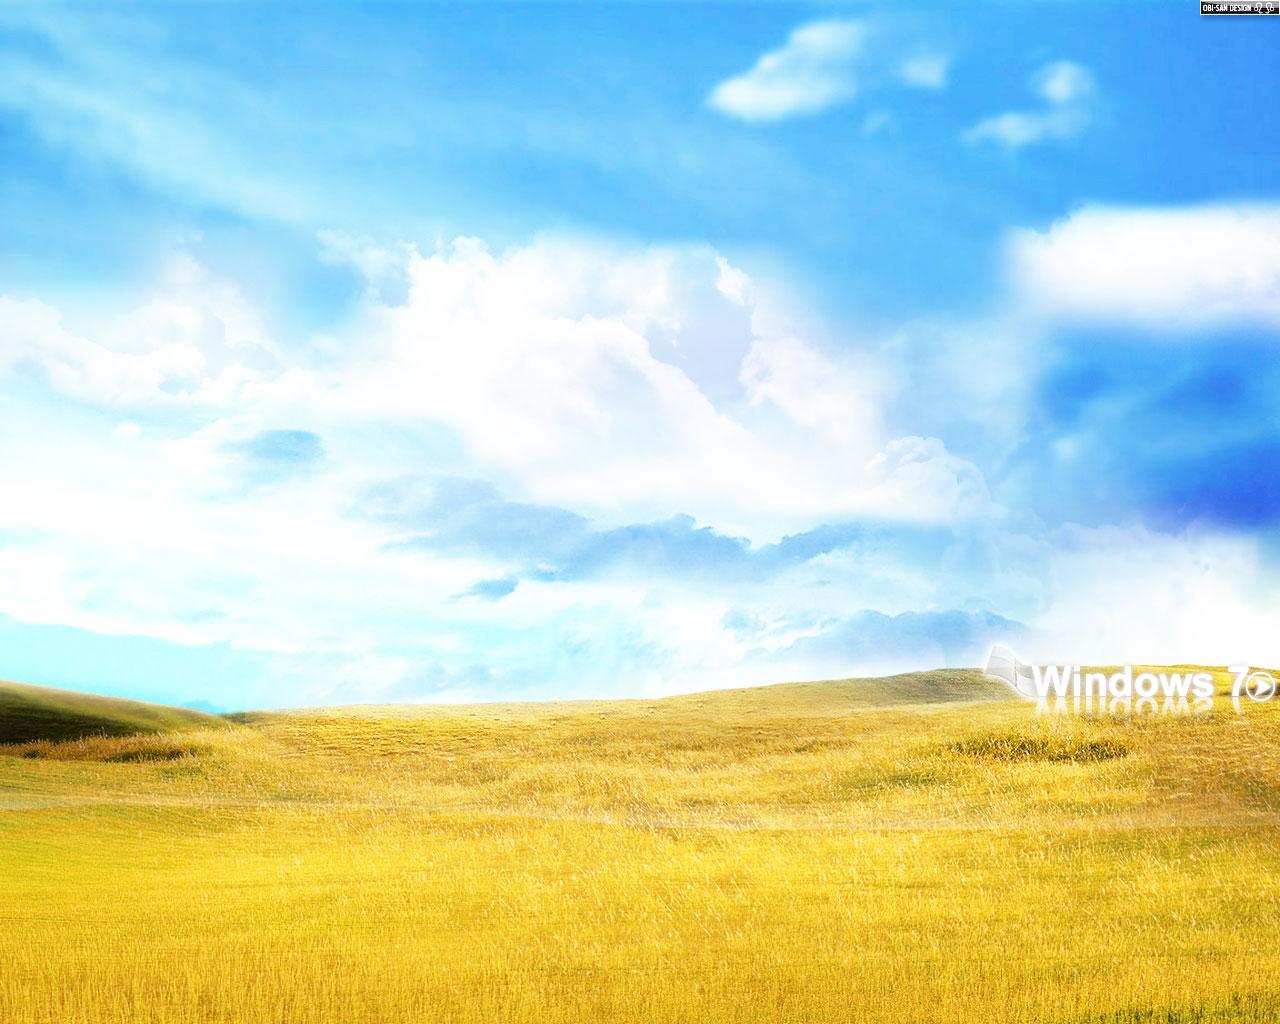 10 best windows 10 wallpapers | free hd wallpapers.